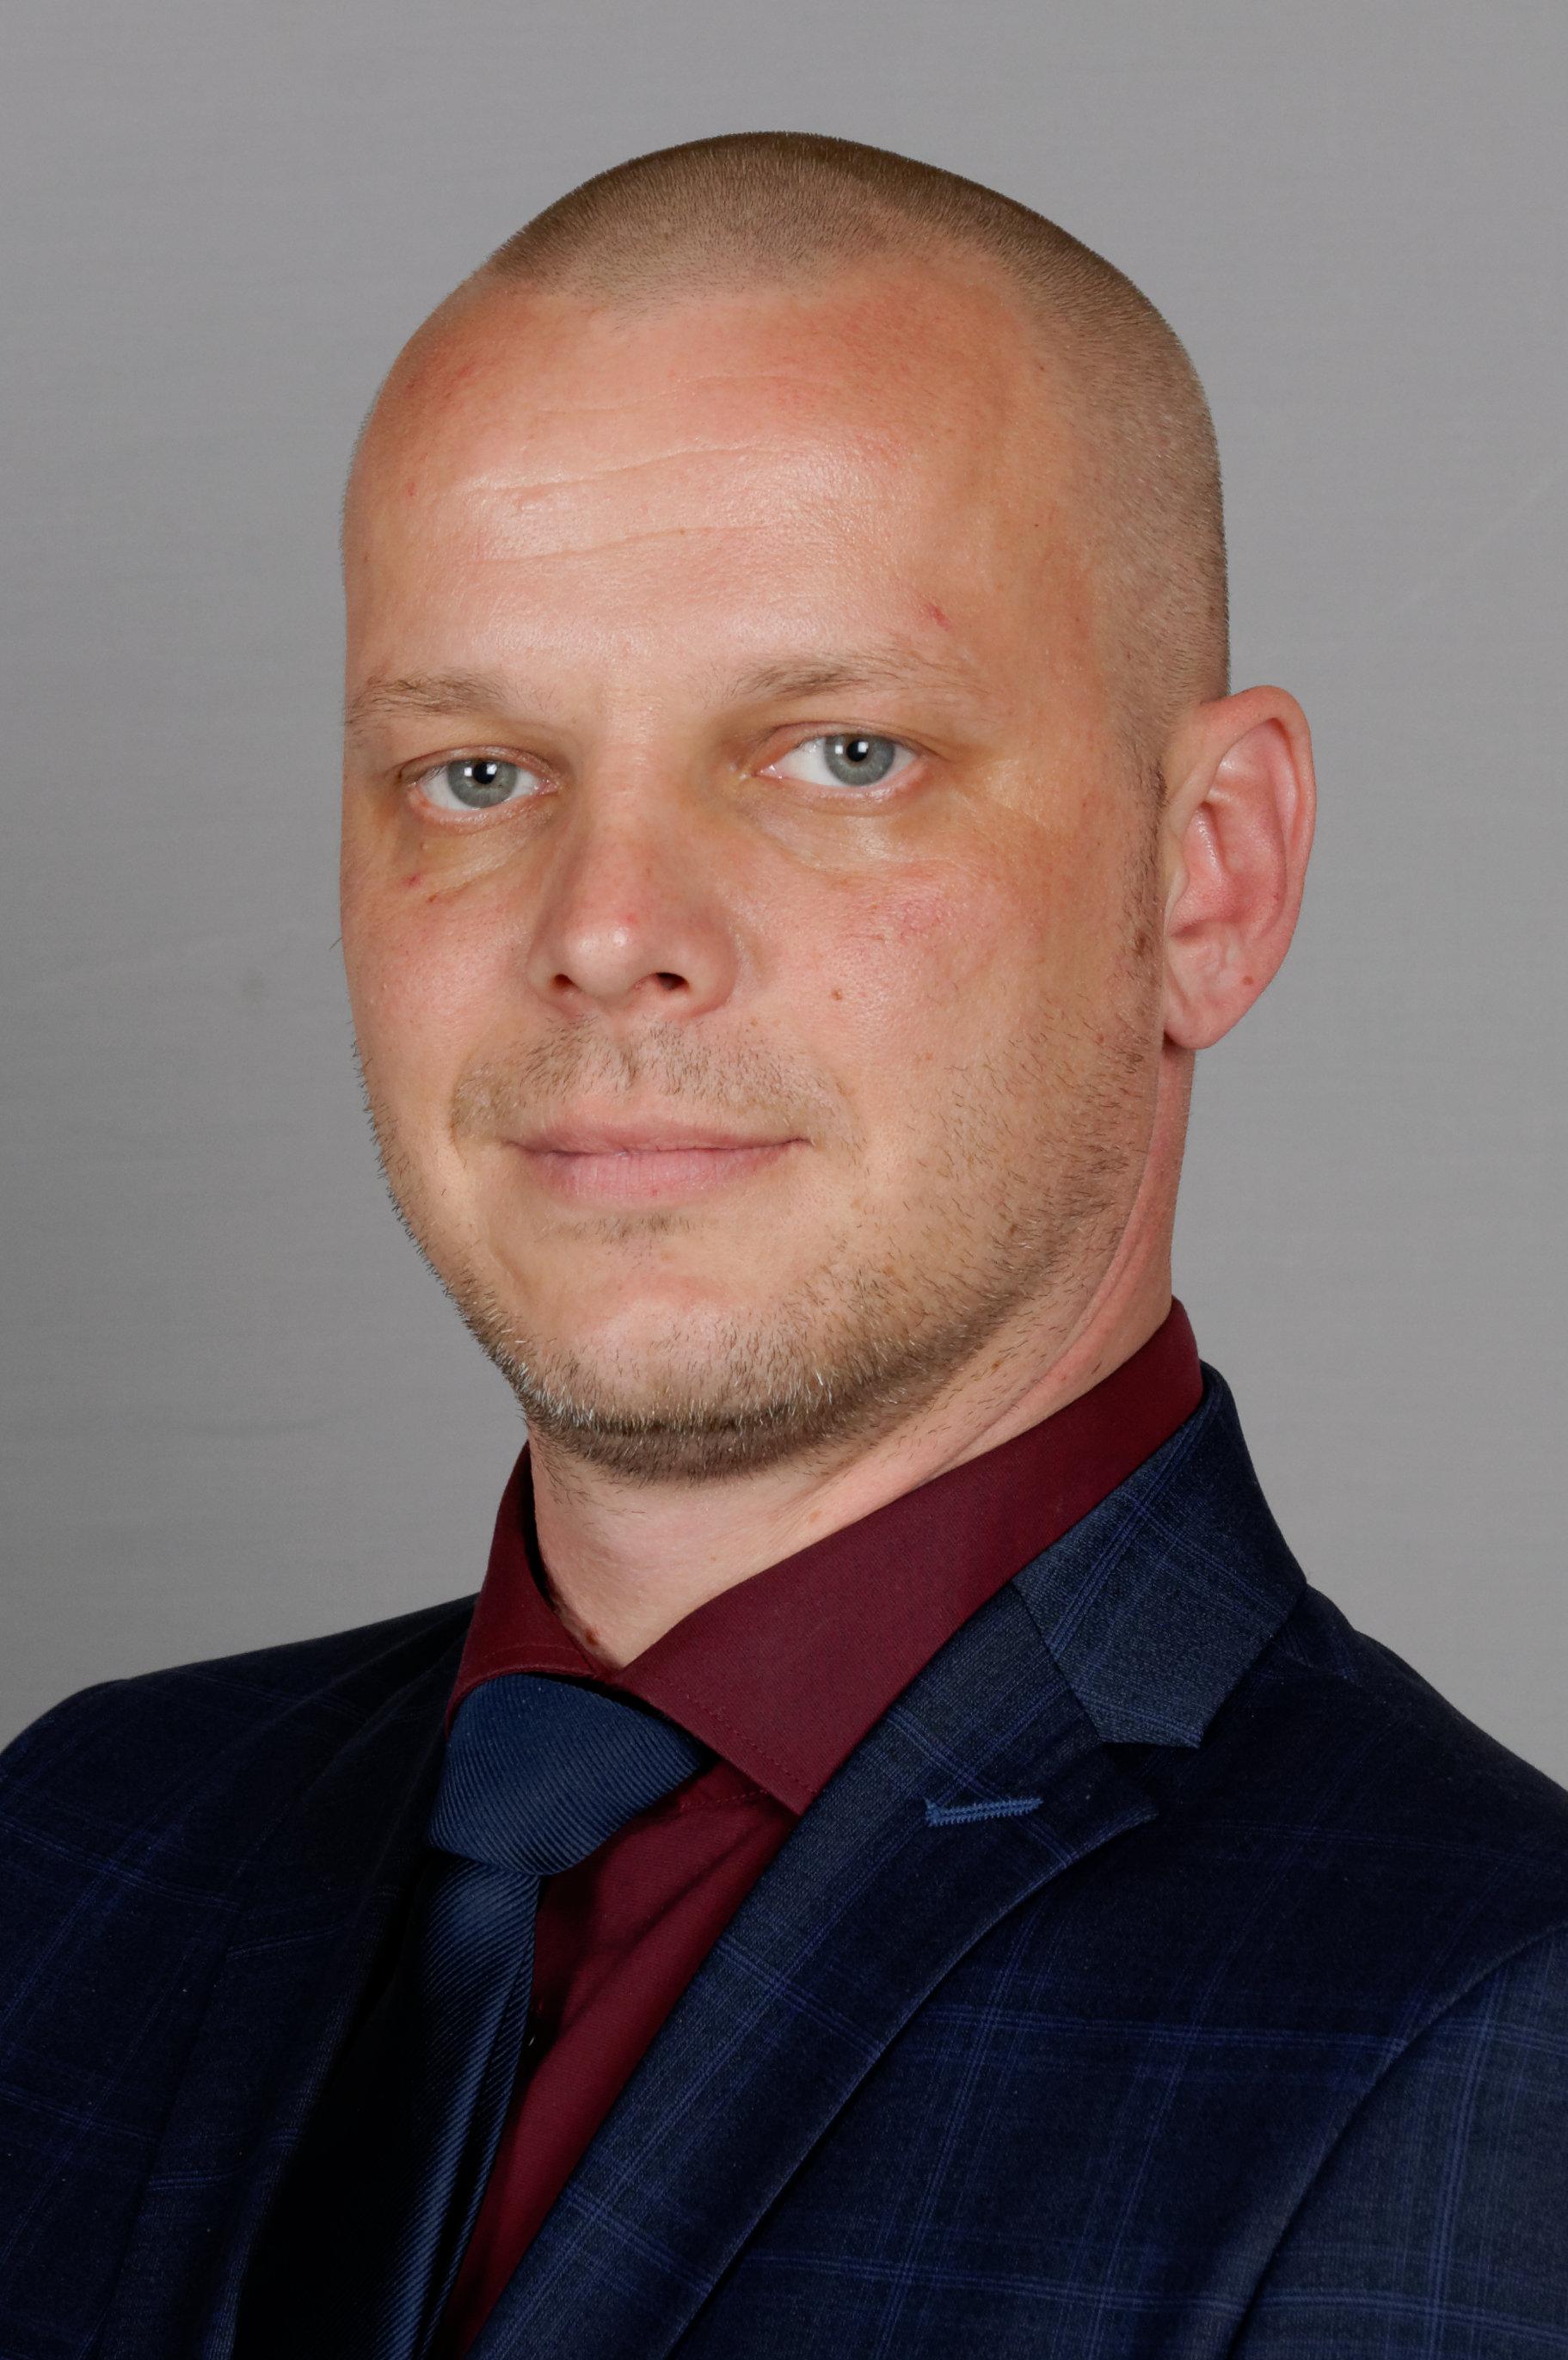 18-05-2017-Nikolaus Kramer-JonasR.jpg